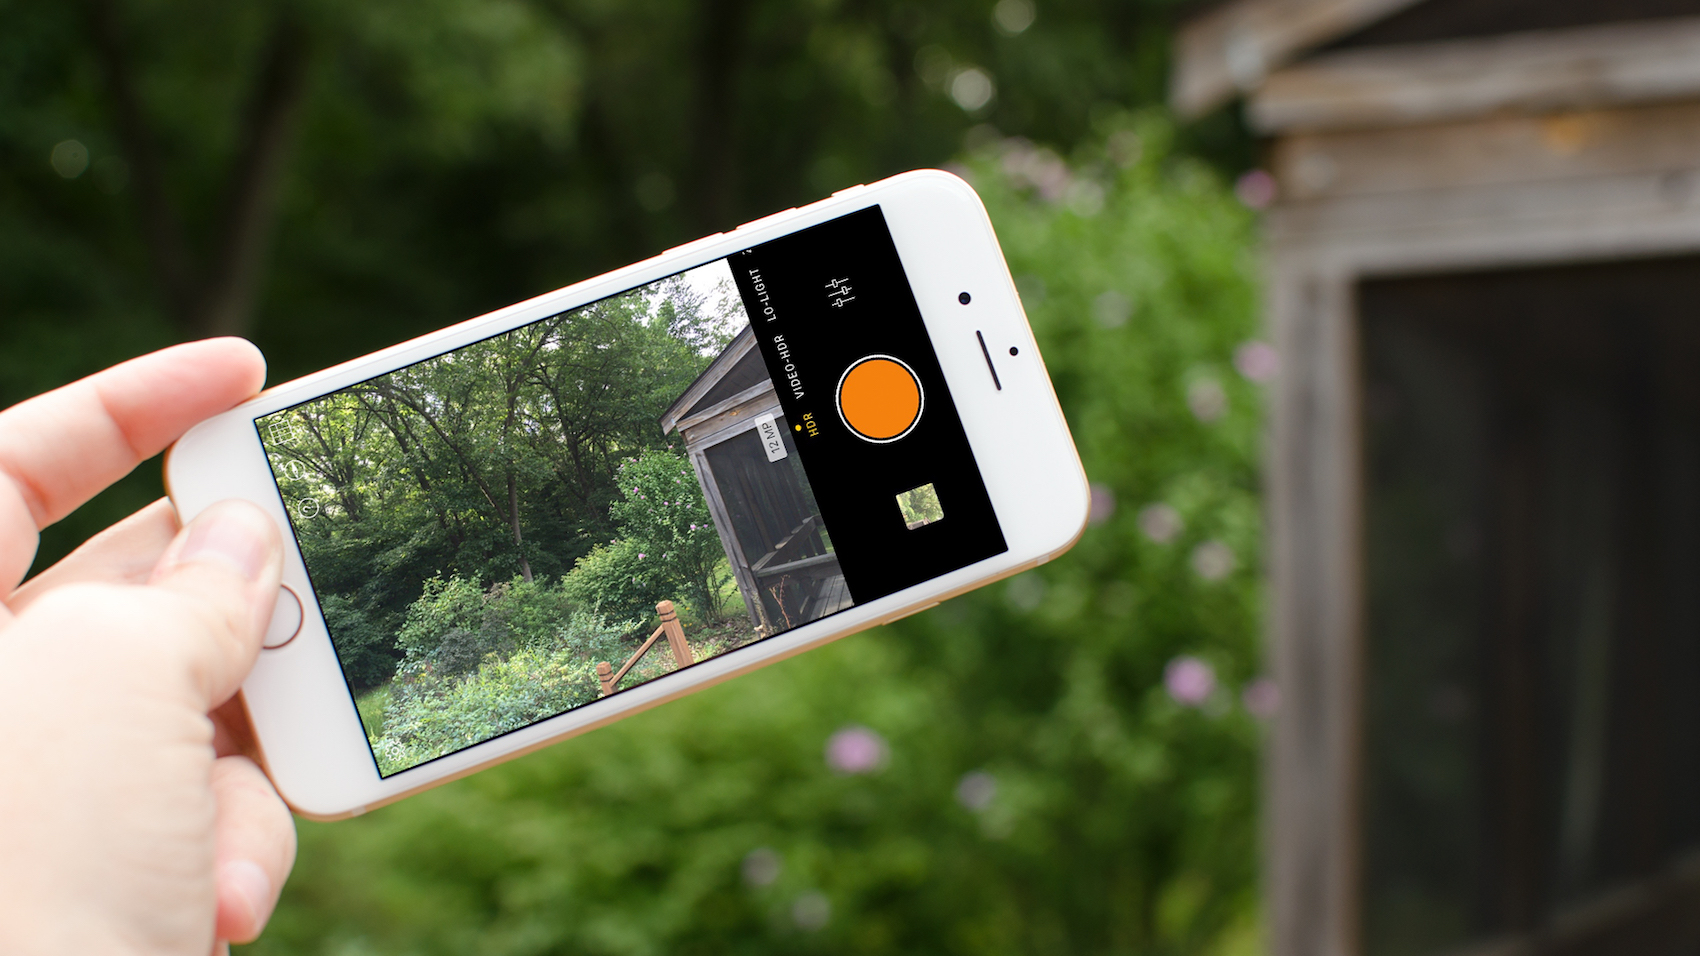 Apple rethinks photos in iOS 10